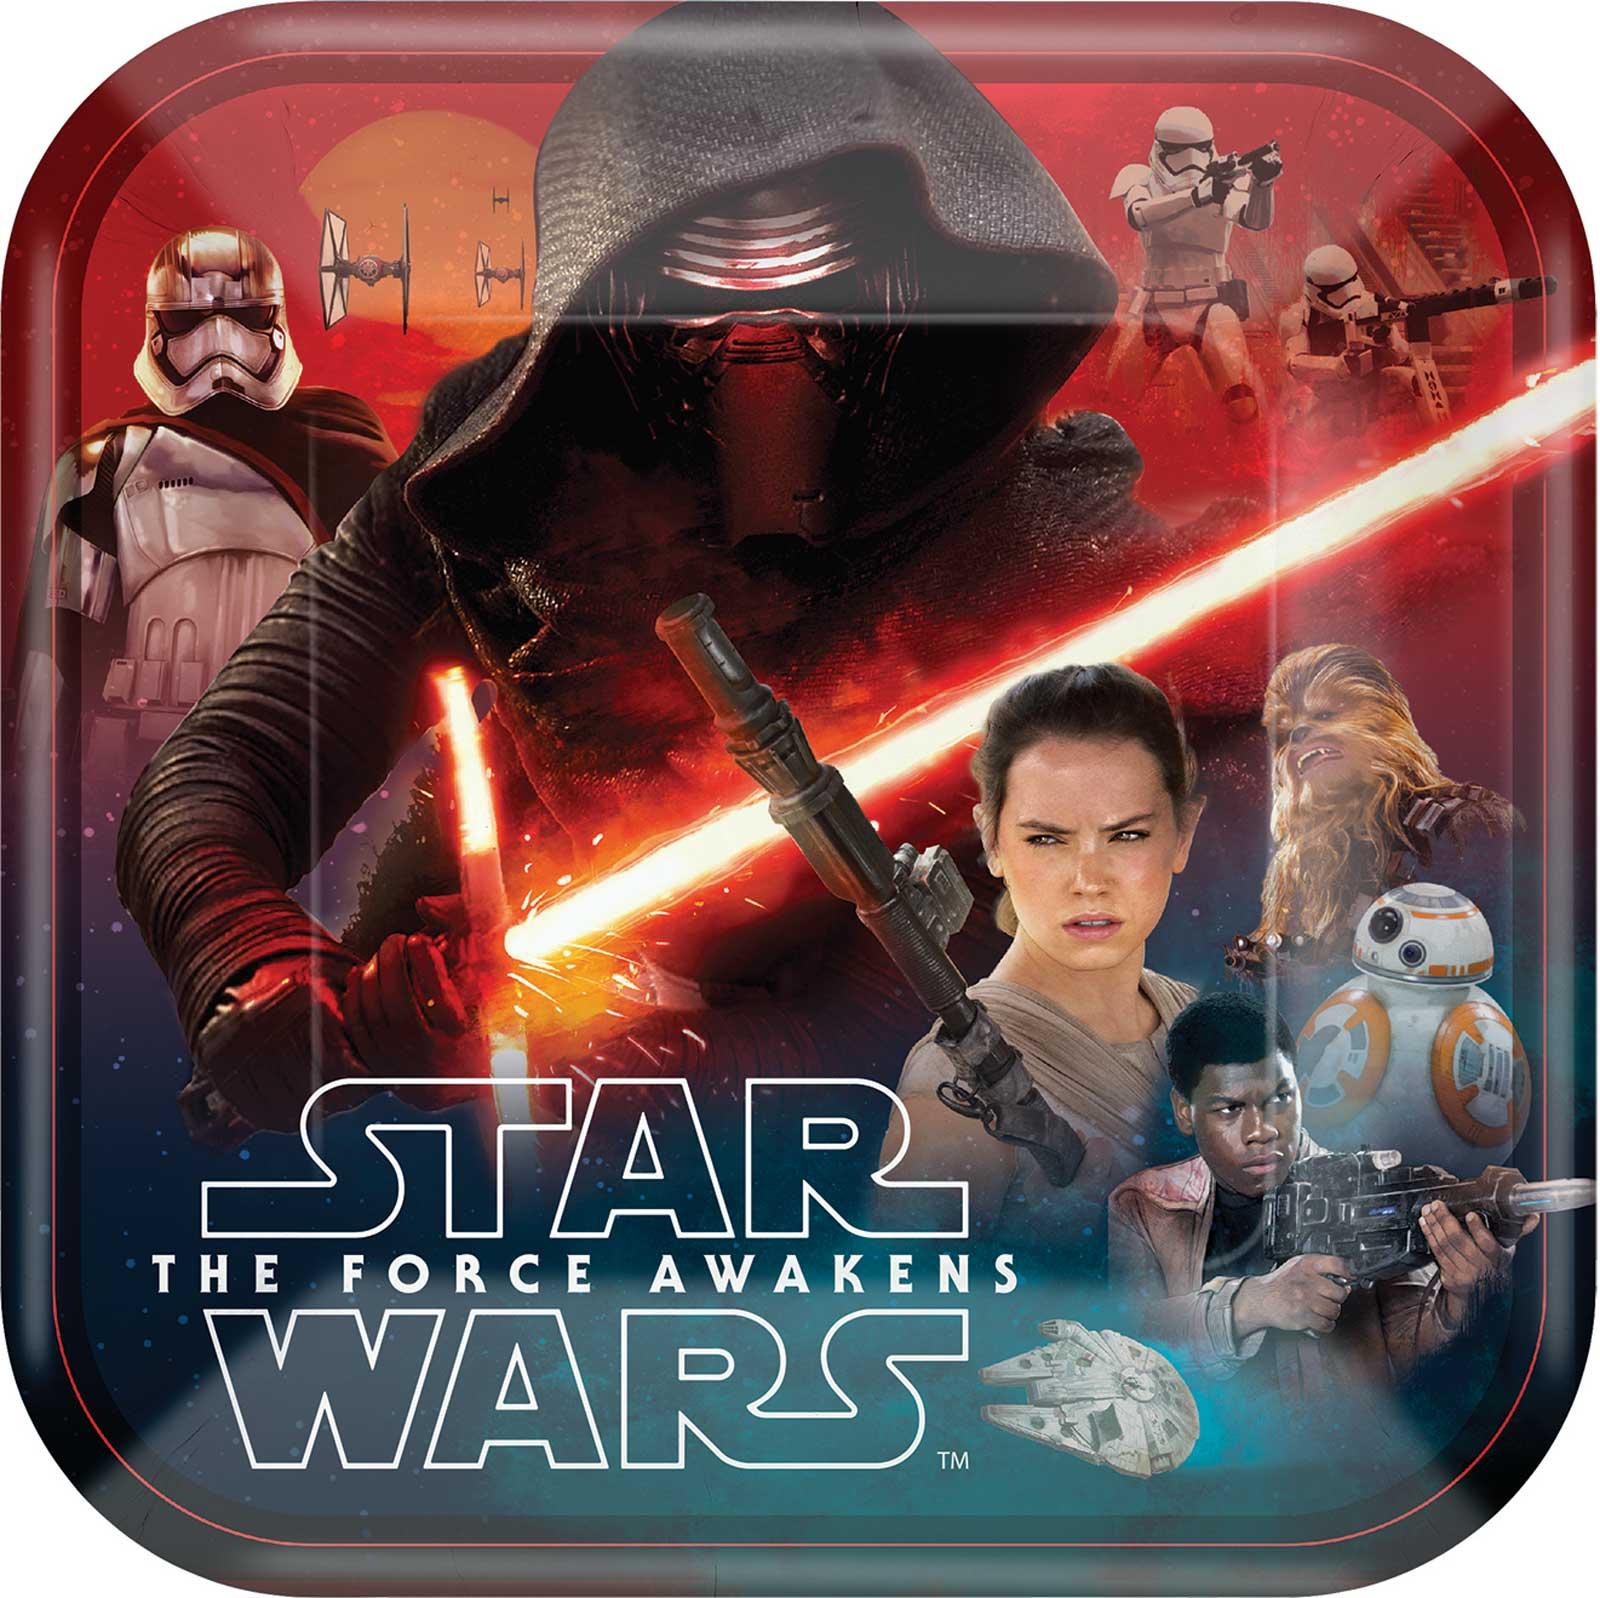 sc 1 st  Birthday Express & Star Wars 7 The Force Awakens Dinner Plates | BirthdayExpress.com